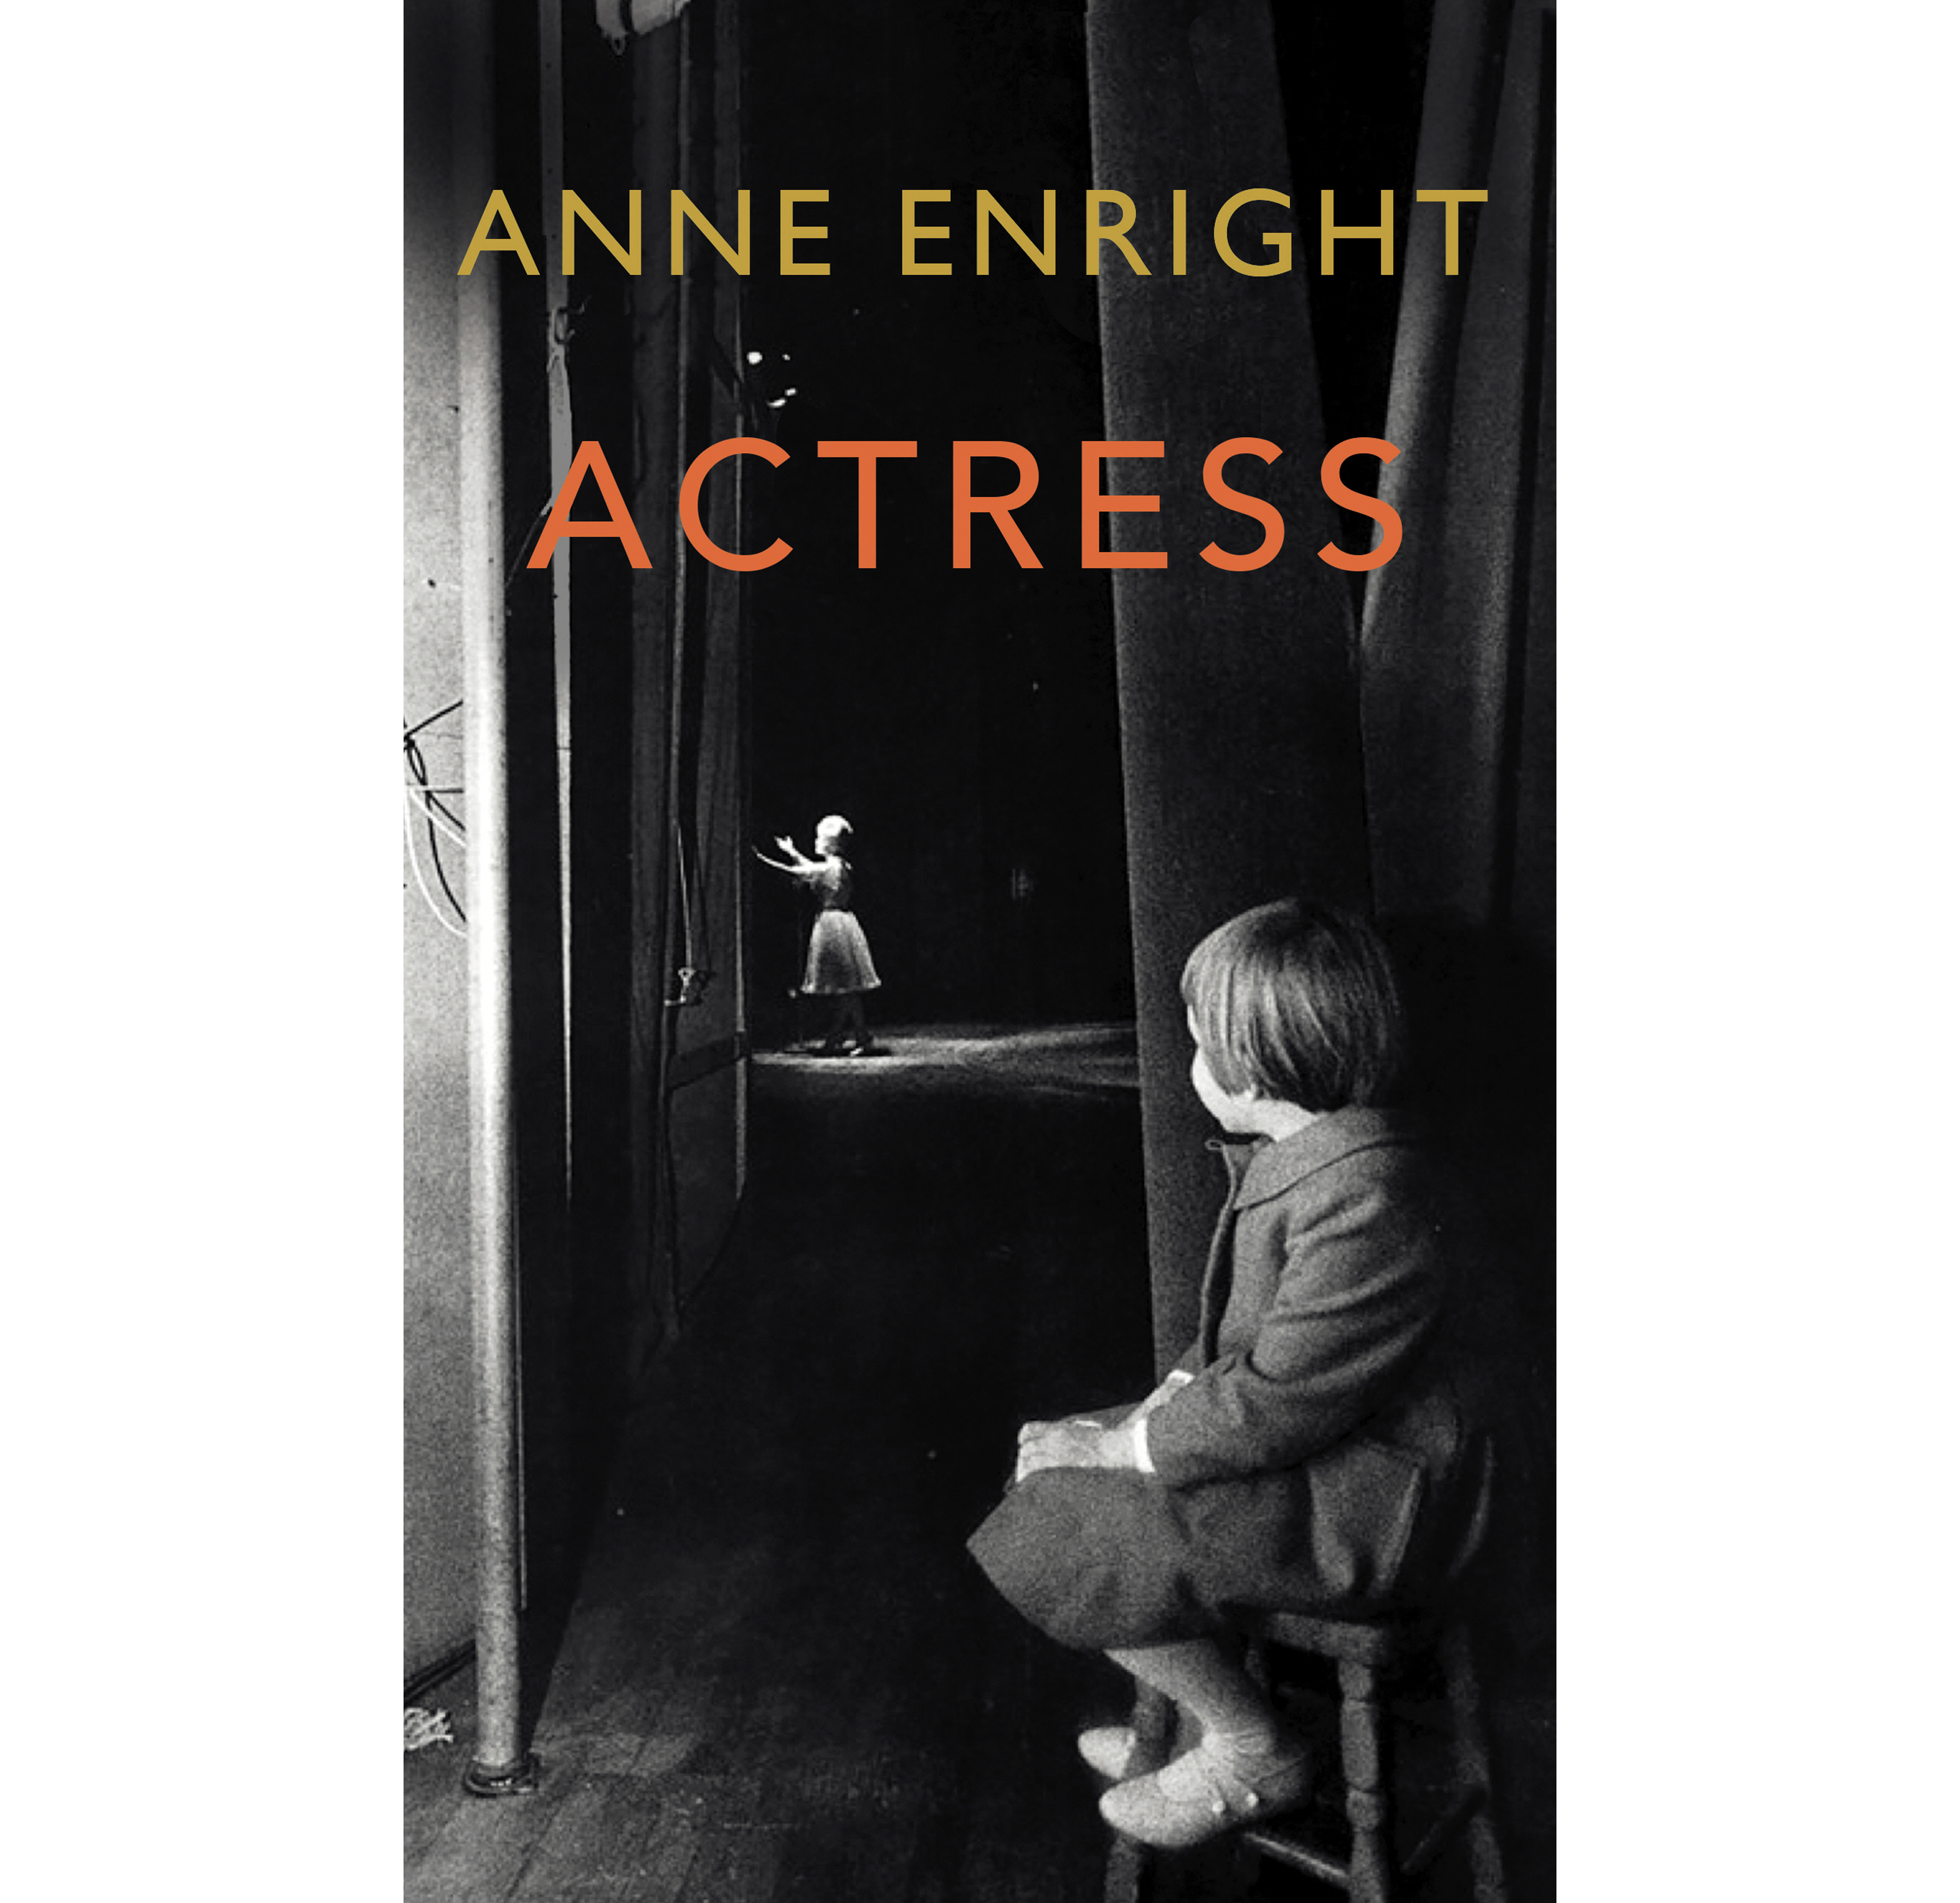 Actress by Anne Enright (Jonathan Cape/PA)